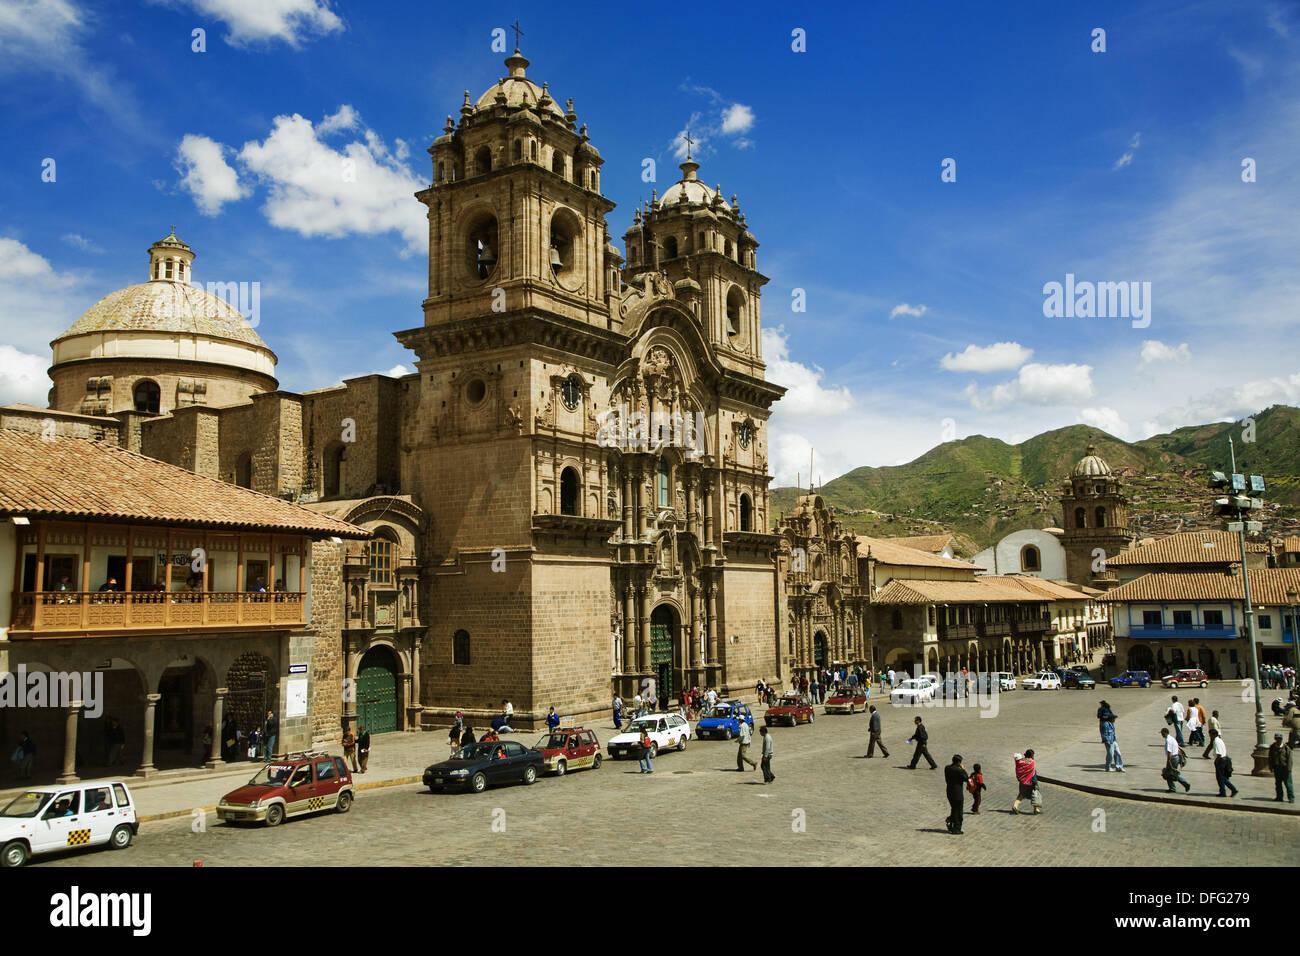 Chuch of the Society of Jesus in Plaza de Armas, Cusco, Peru - Stock Image